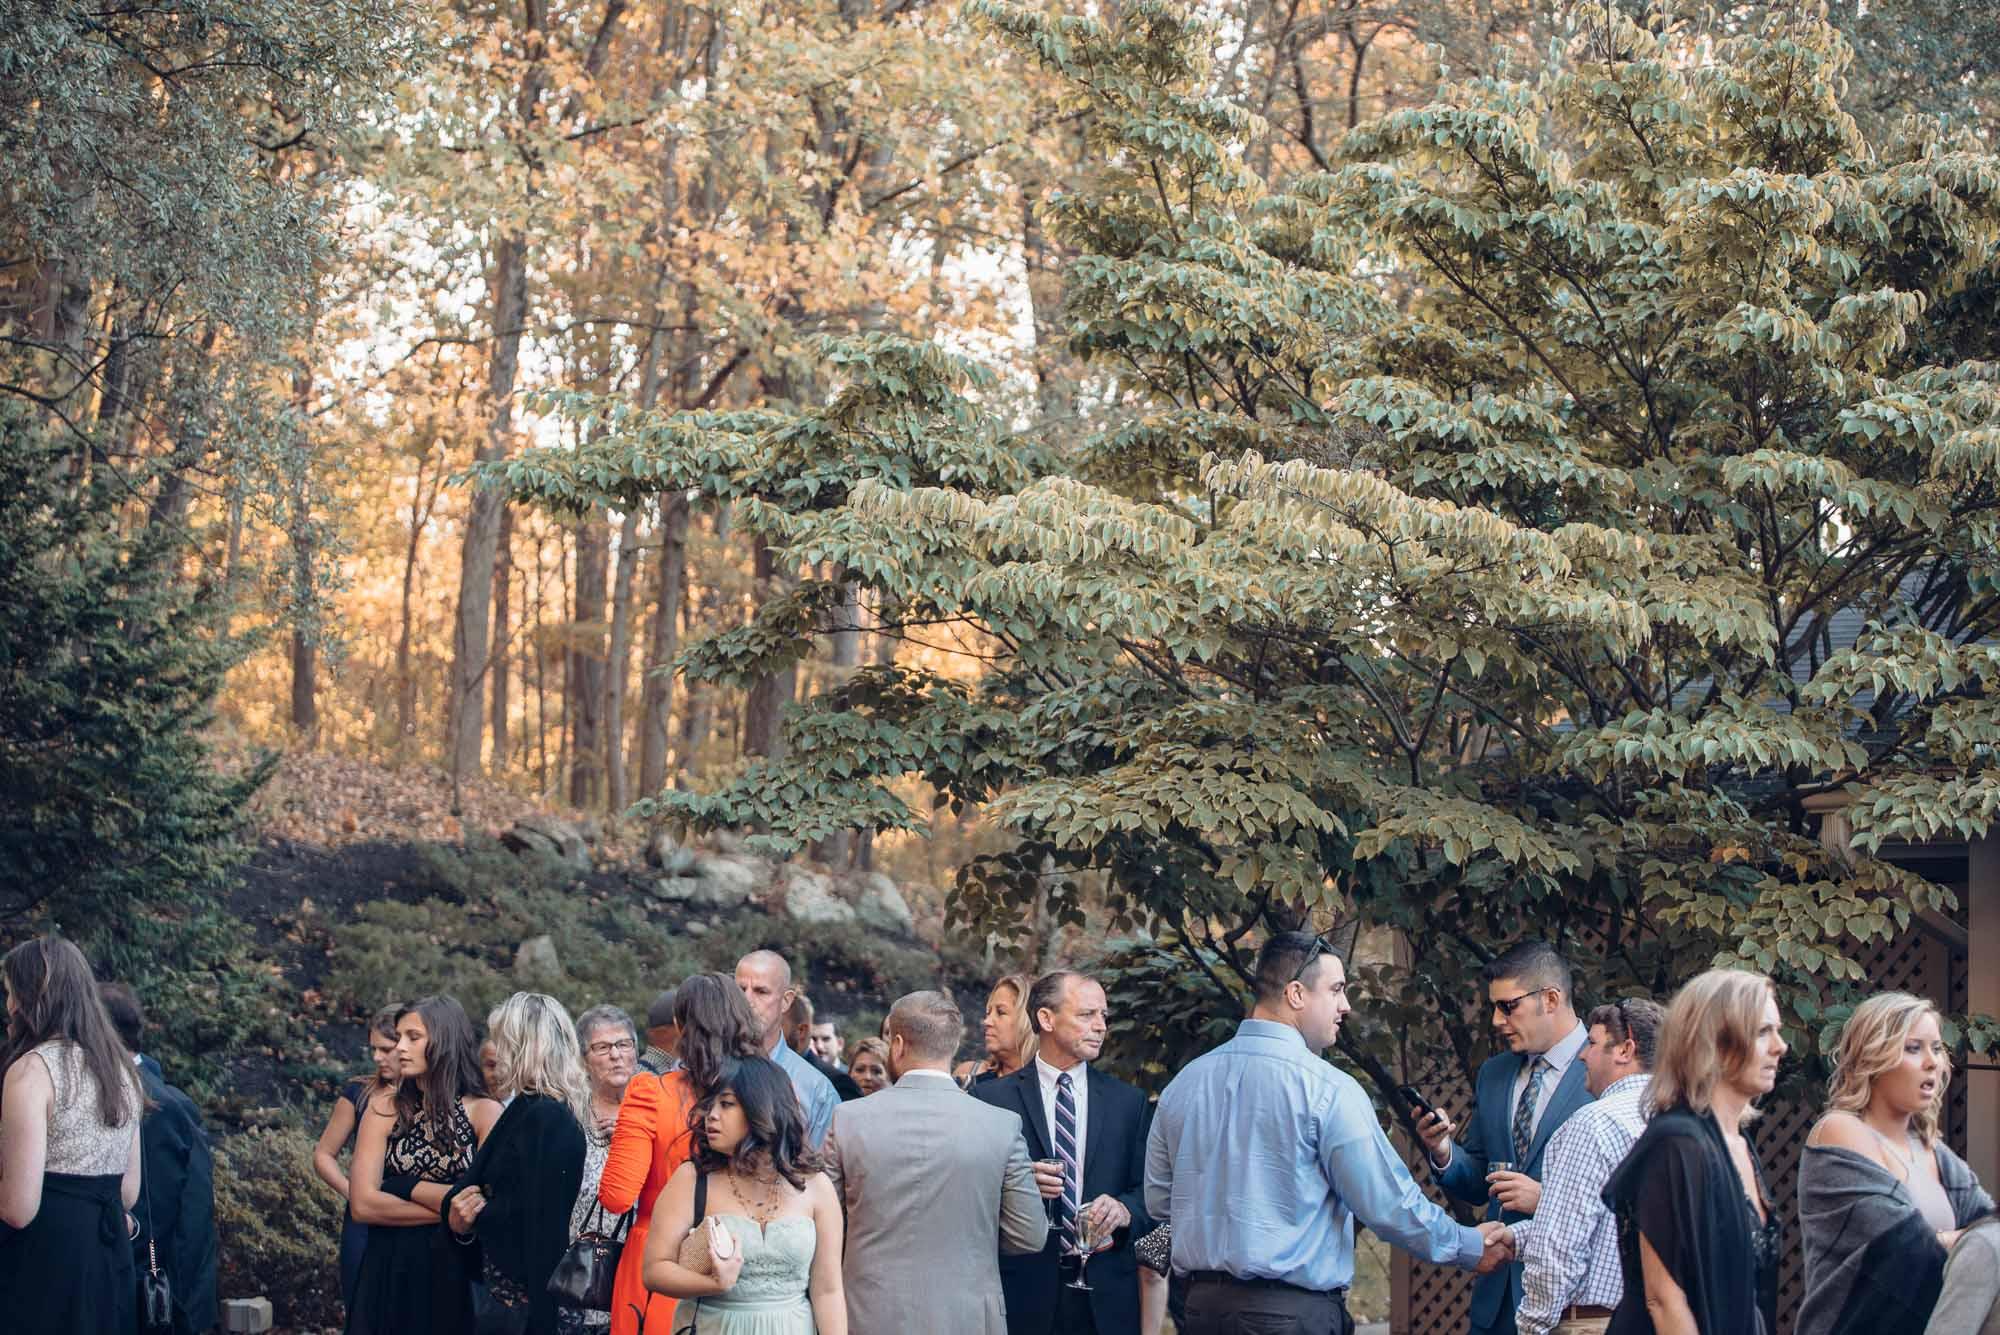 woodwinds_wedding_171020_web-28.jpg